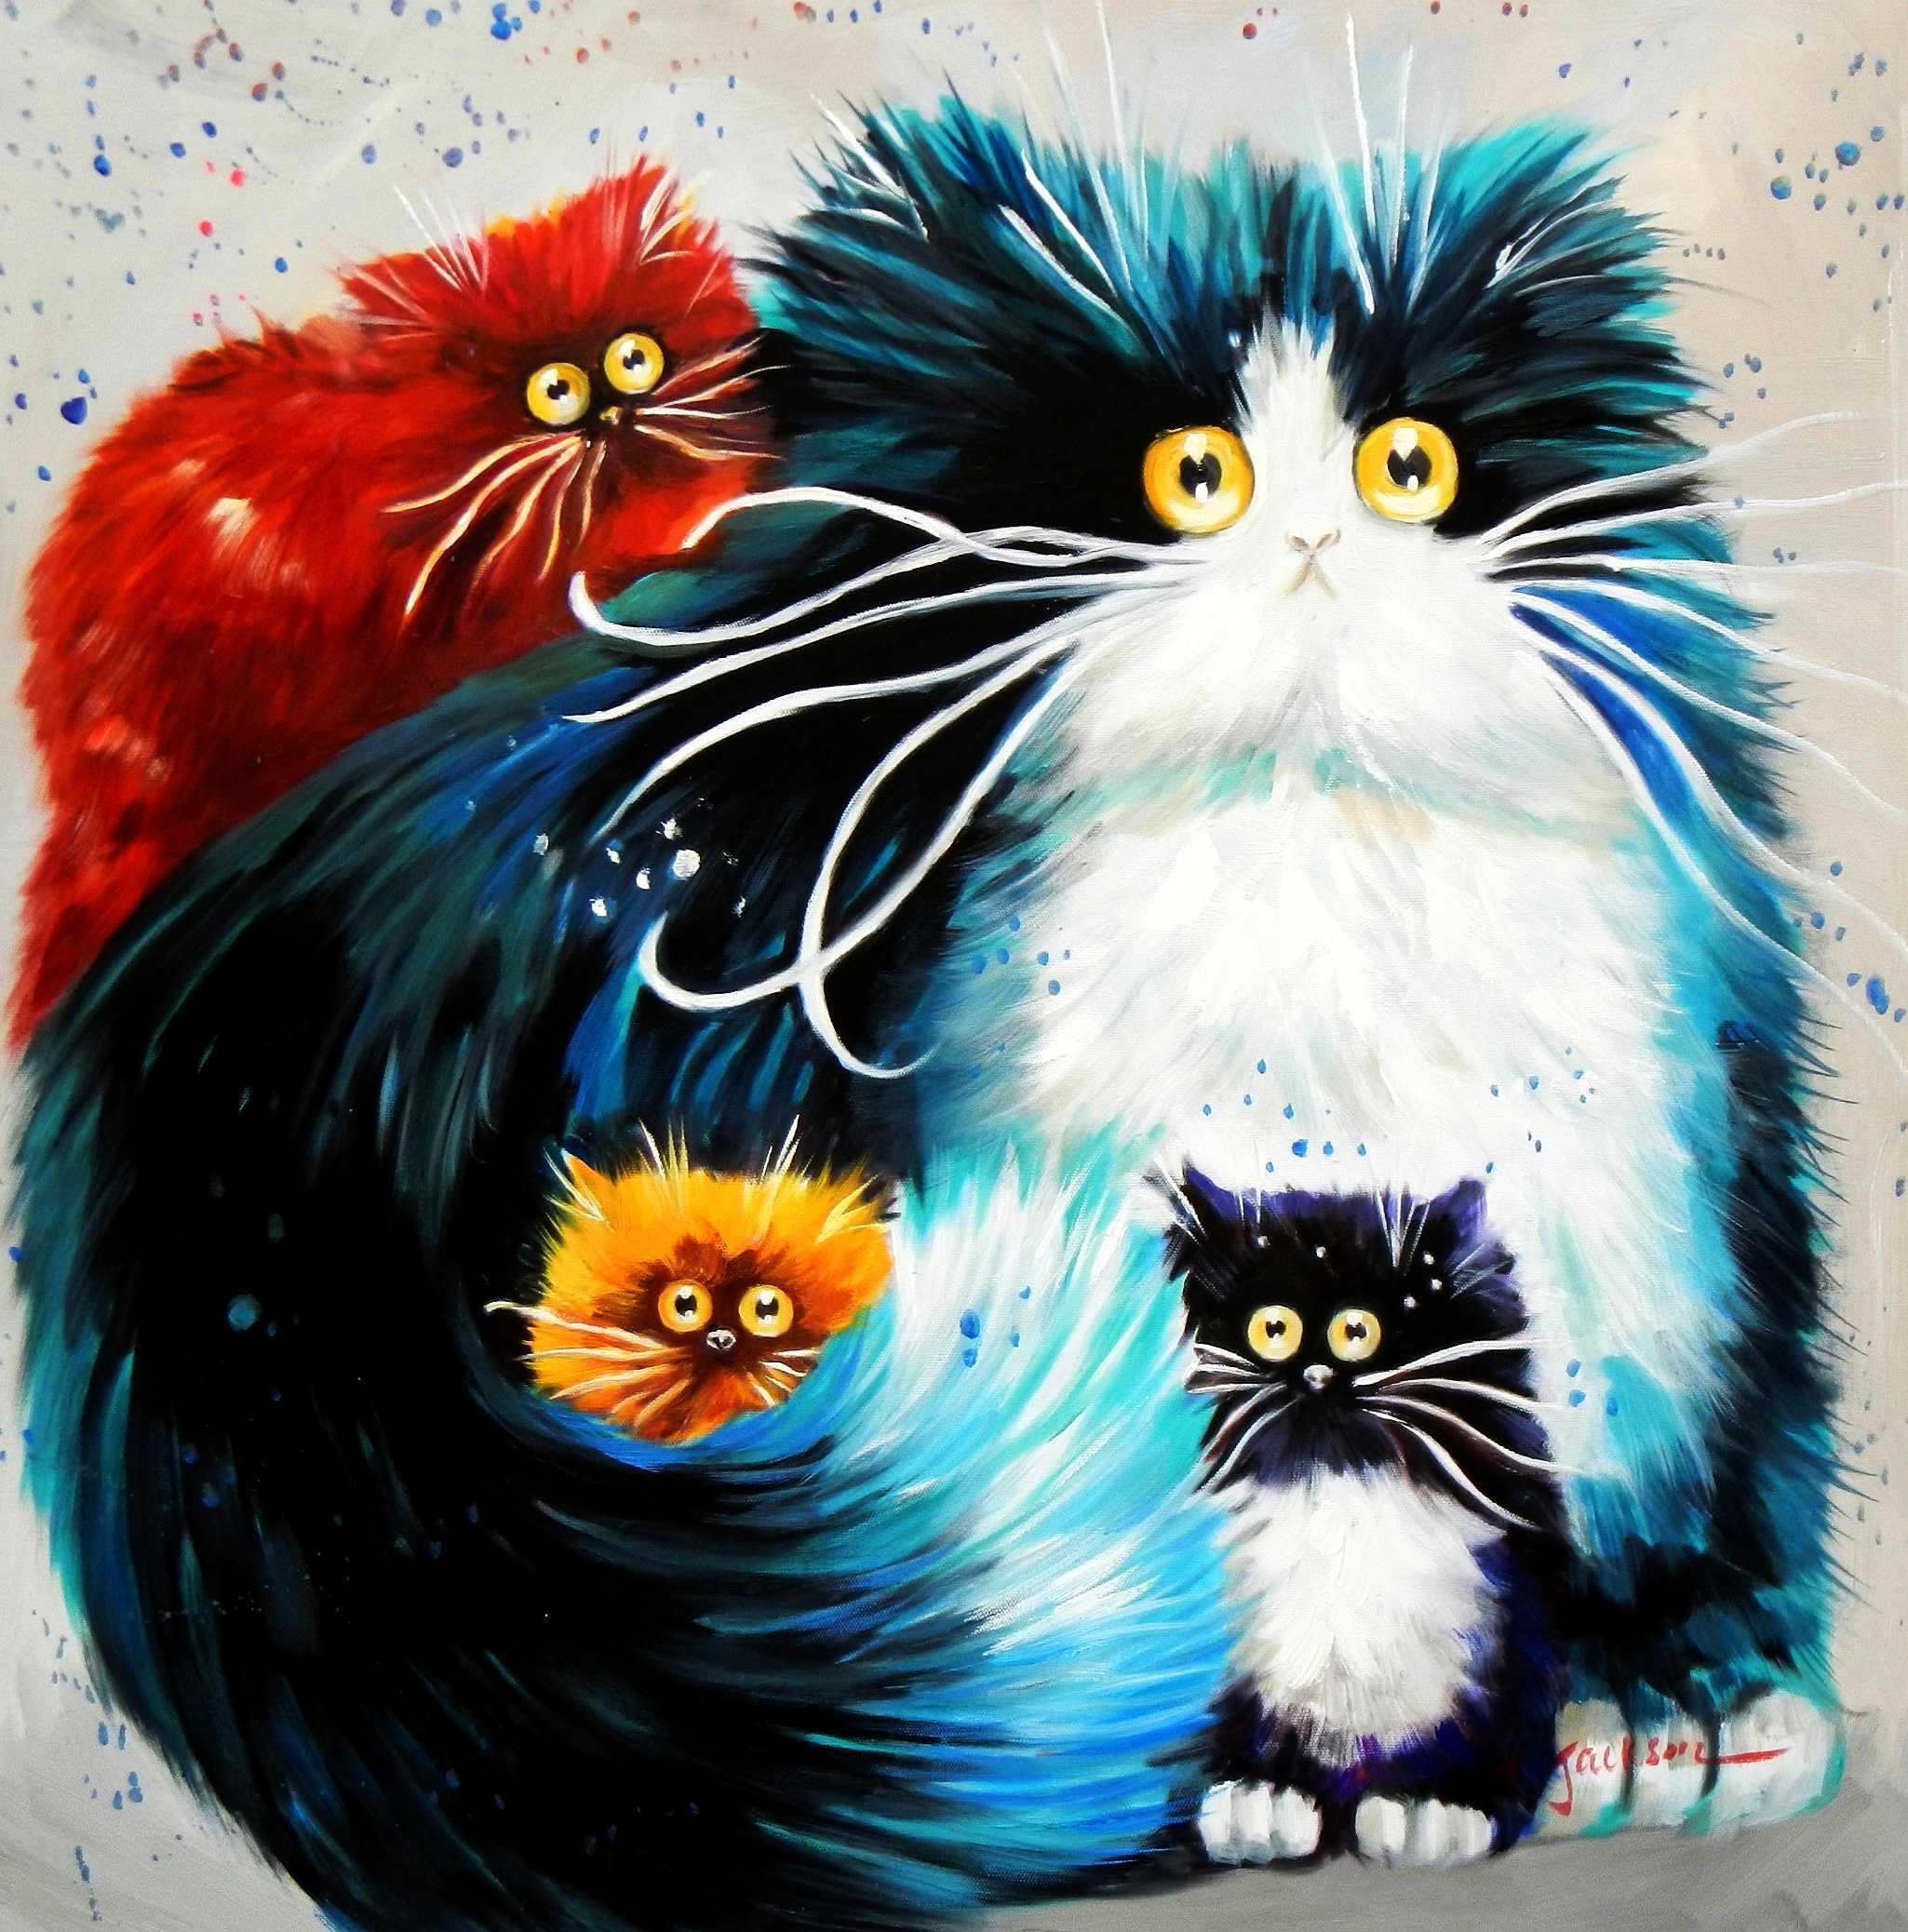 Pop Art - Pummeliges Katzenquartett e95068 60x60cm lustiges Ölbild